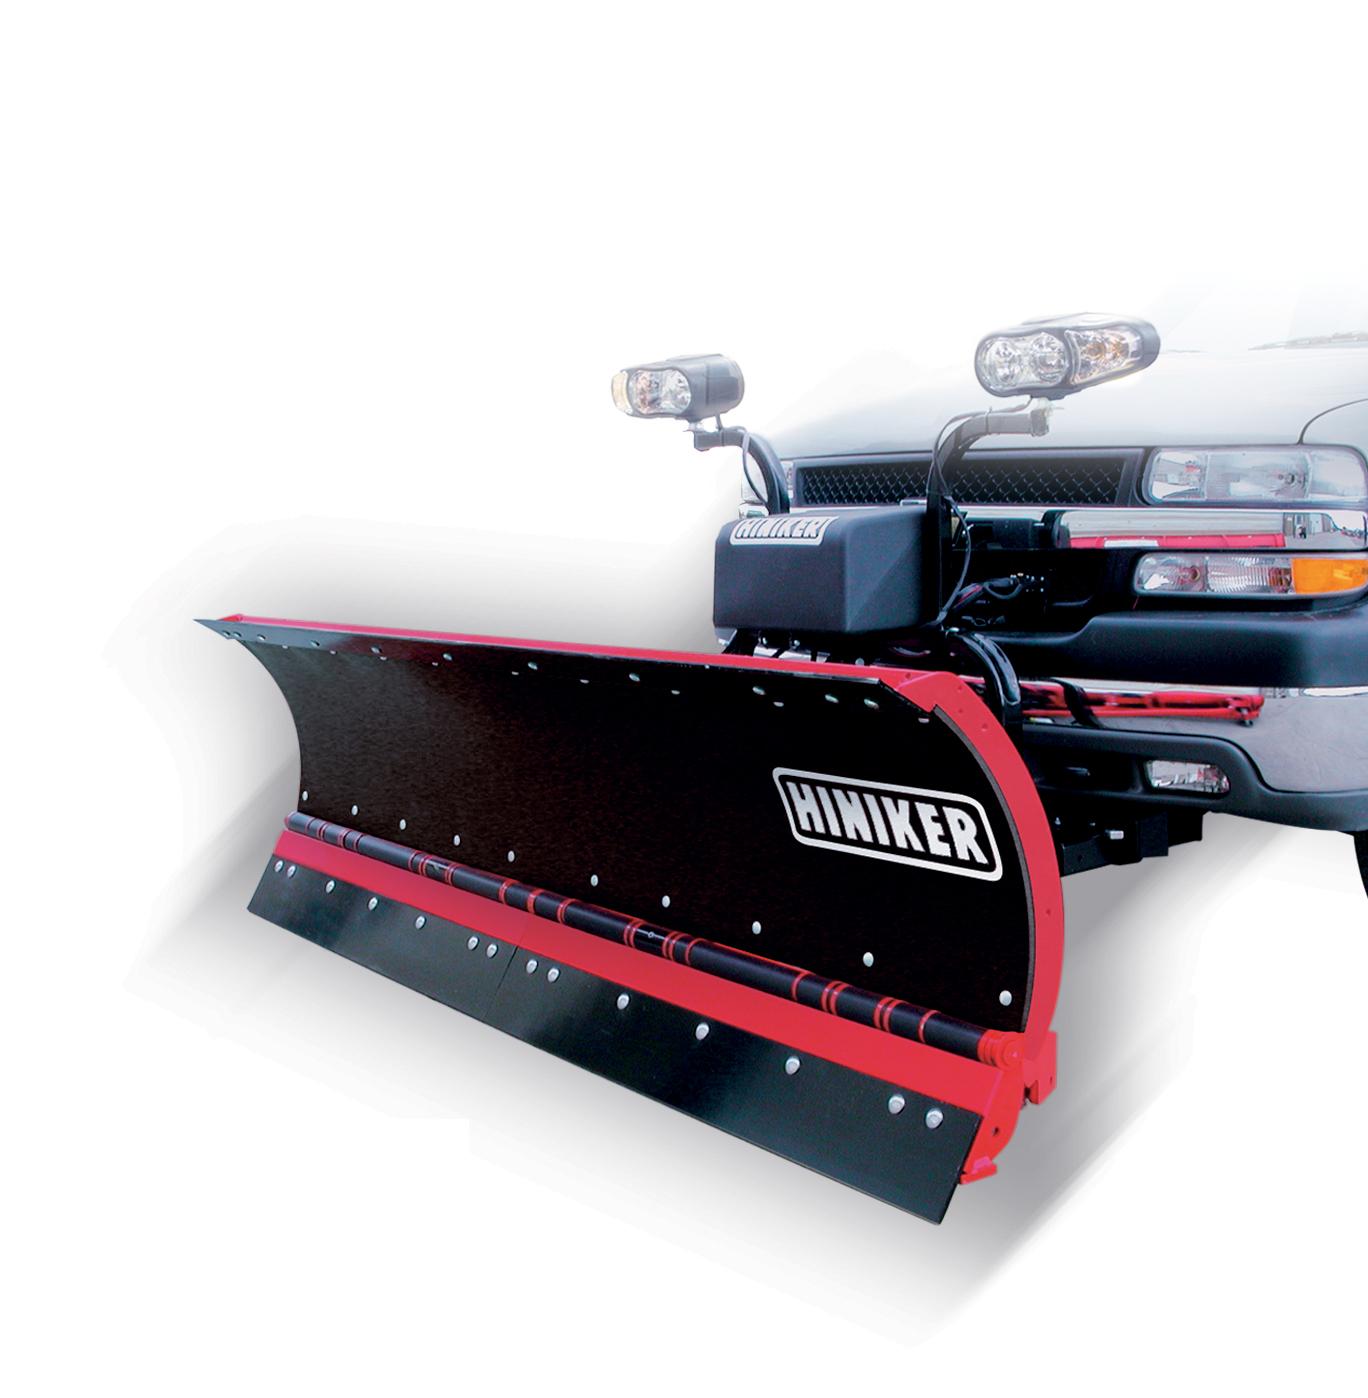 Hiniker Snow Plow Products St. Louis Philadelphia